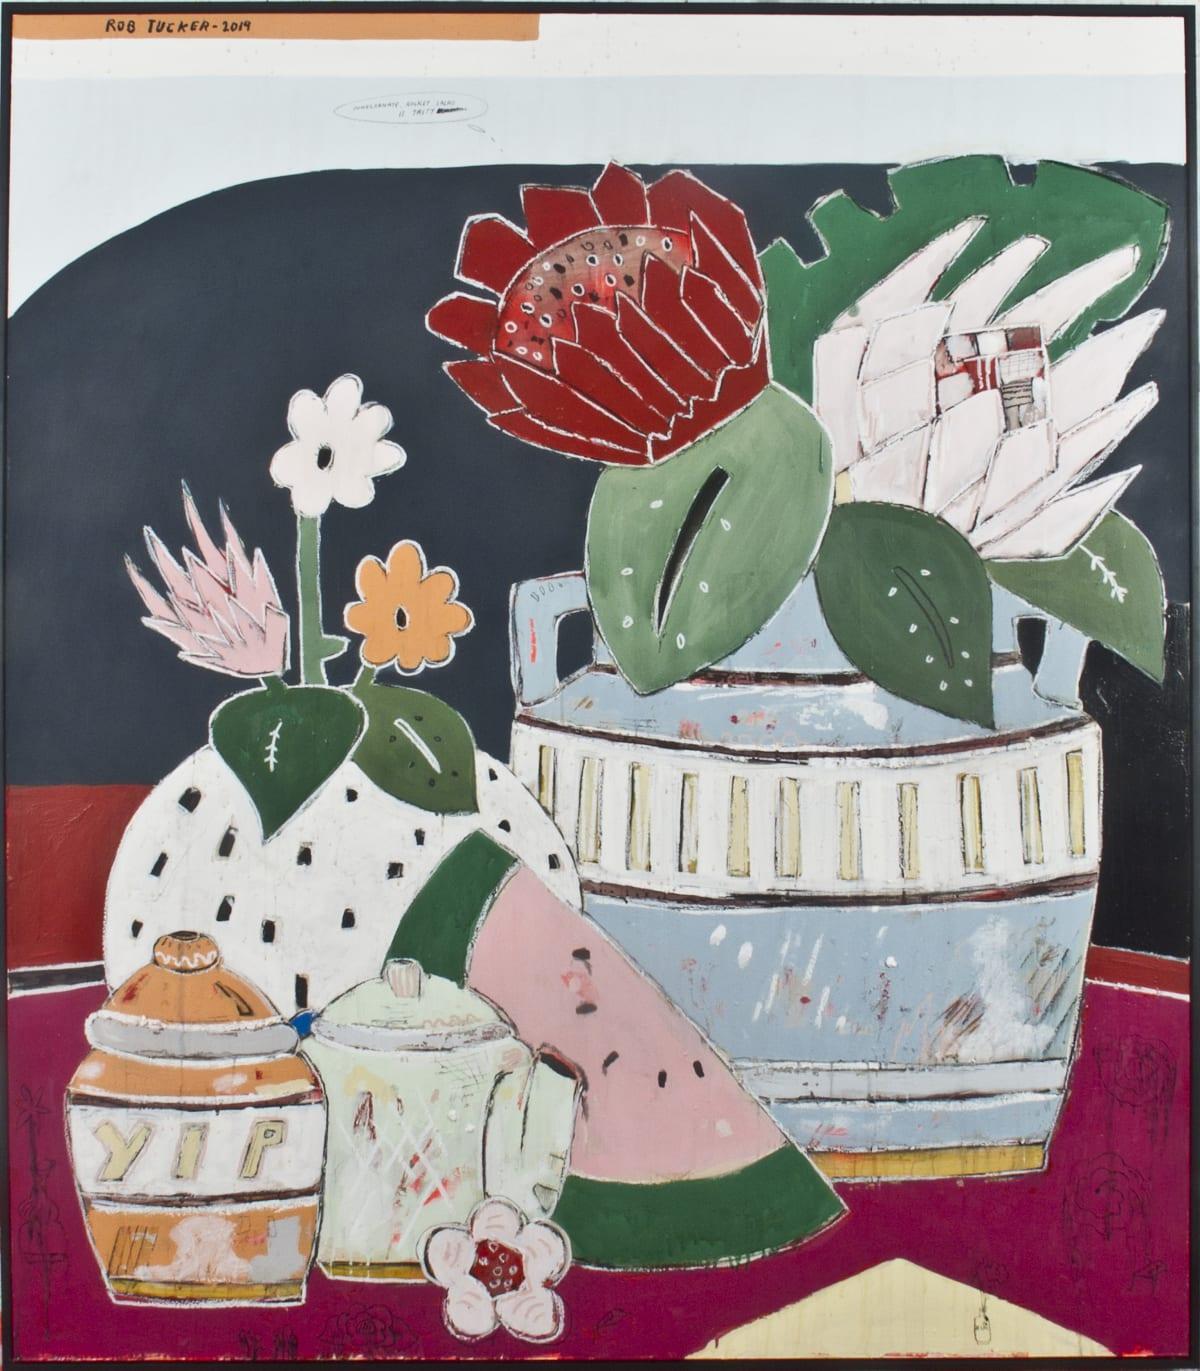 Rob Tucker, Pomegranate, Rocket Salads are Tasty, 2019